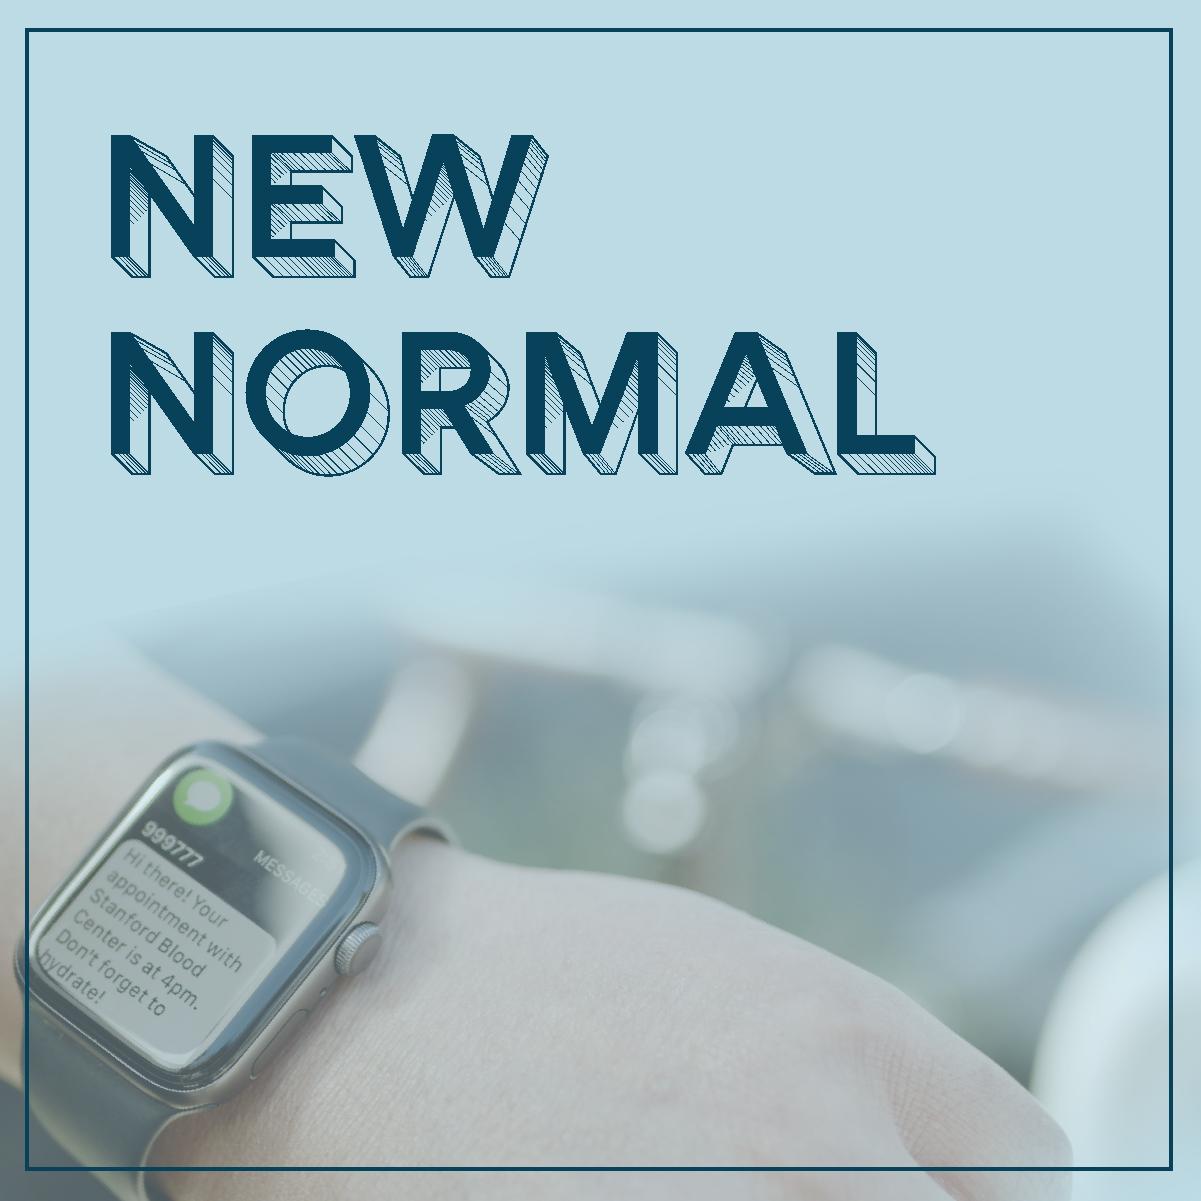 NEW NORMAL RAFFLE